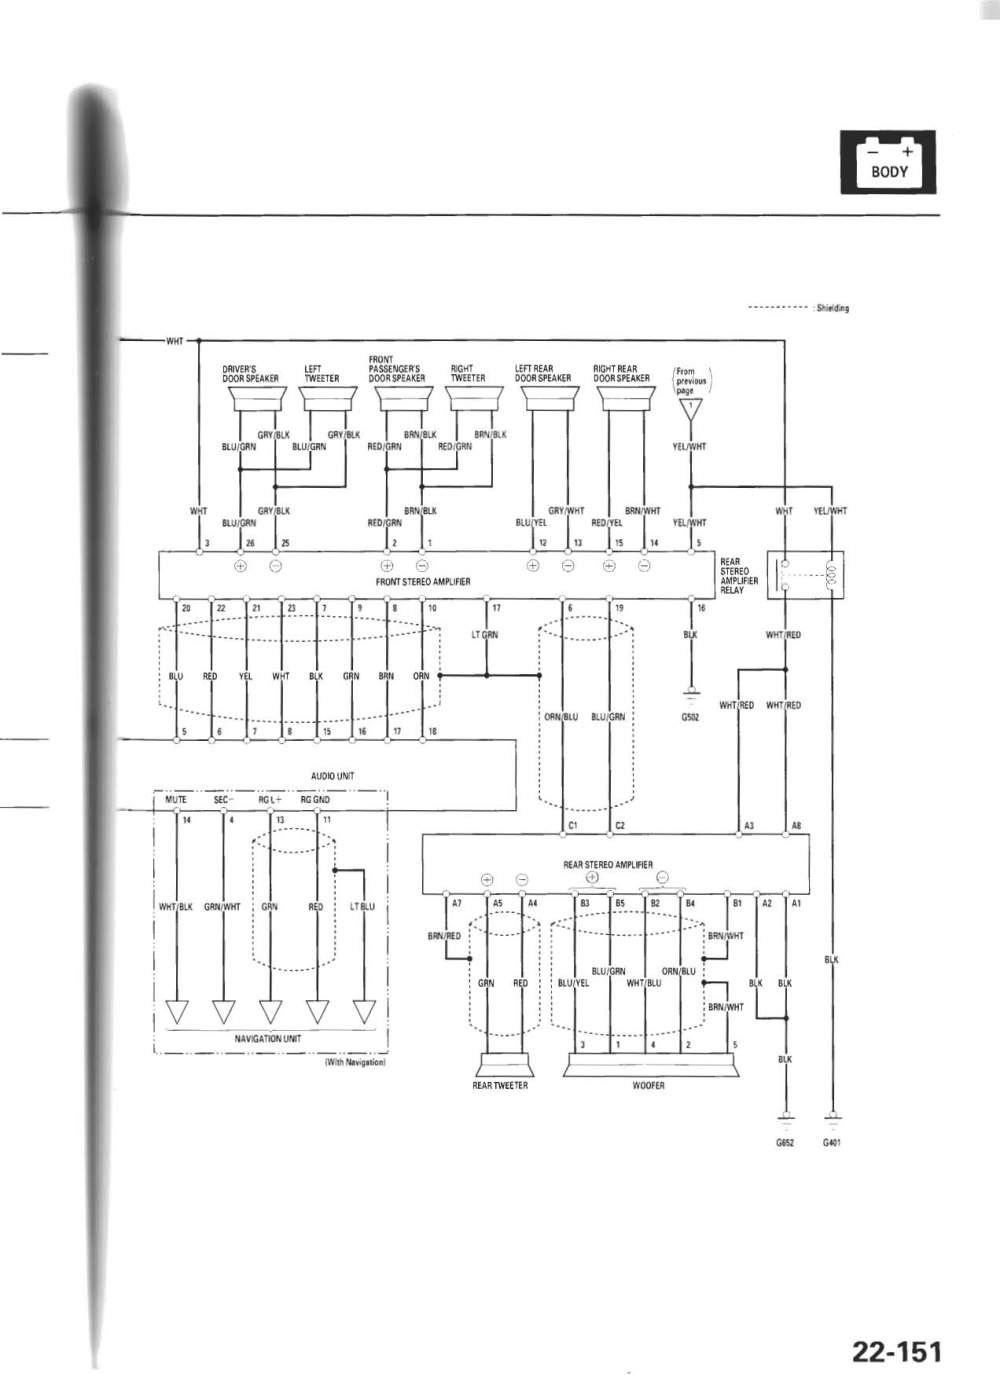 medium resolution of retrofit 01 04 mdx w bluetooth page 2 acura mdx forum acura acura mdx 2006 wiring diagram acura mdx wiring diagram